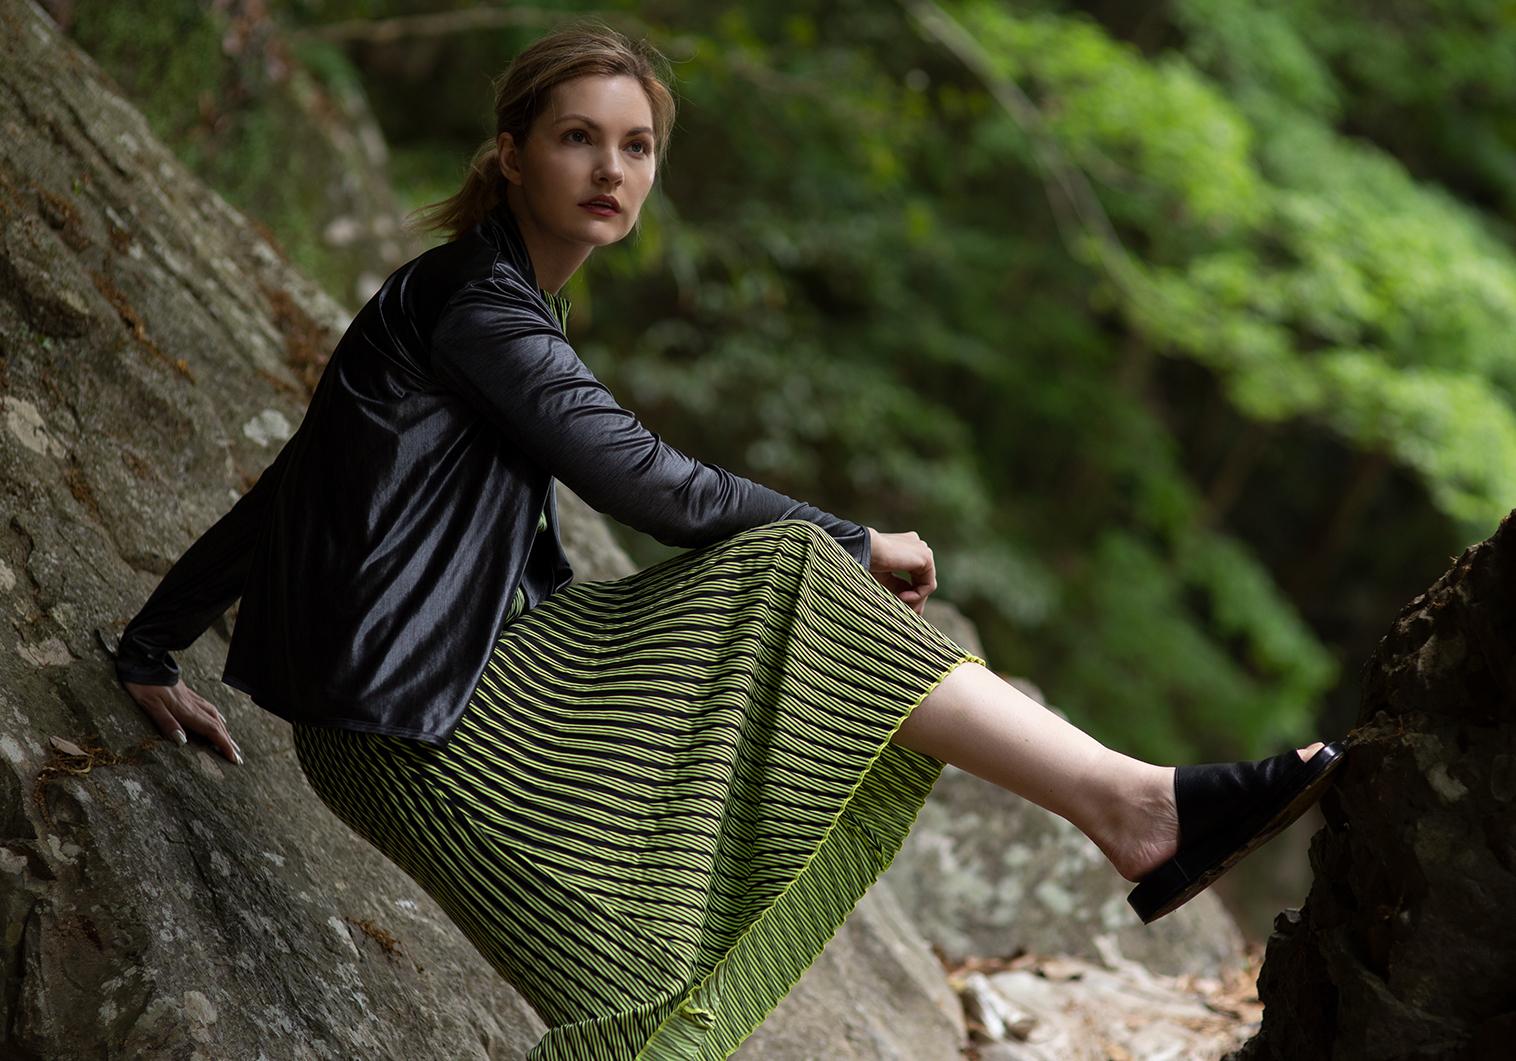 ISSEY MIYAKE Secondhand clothing